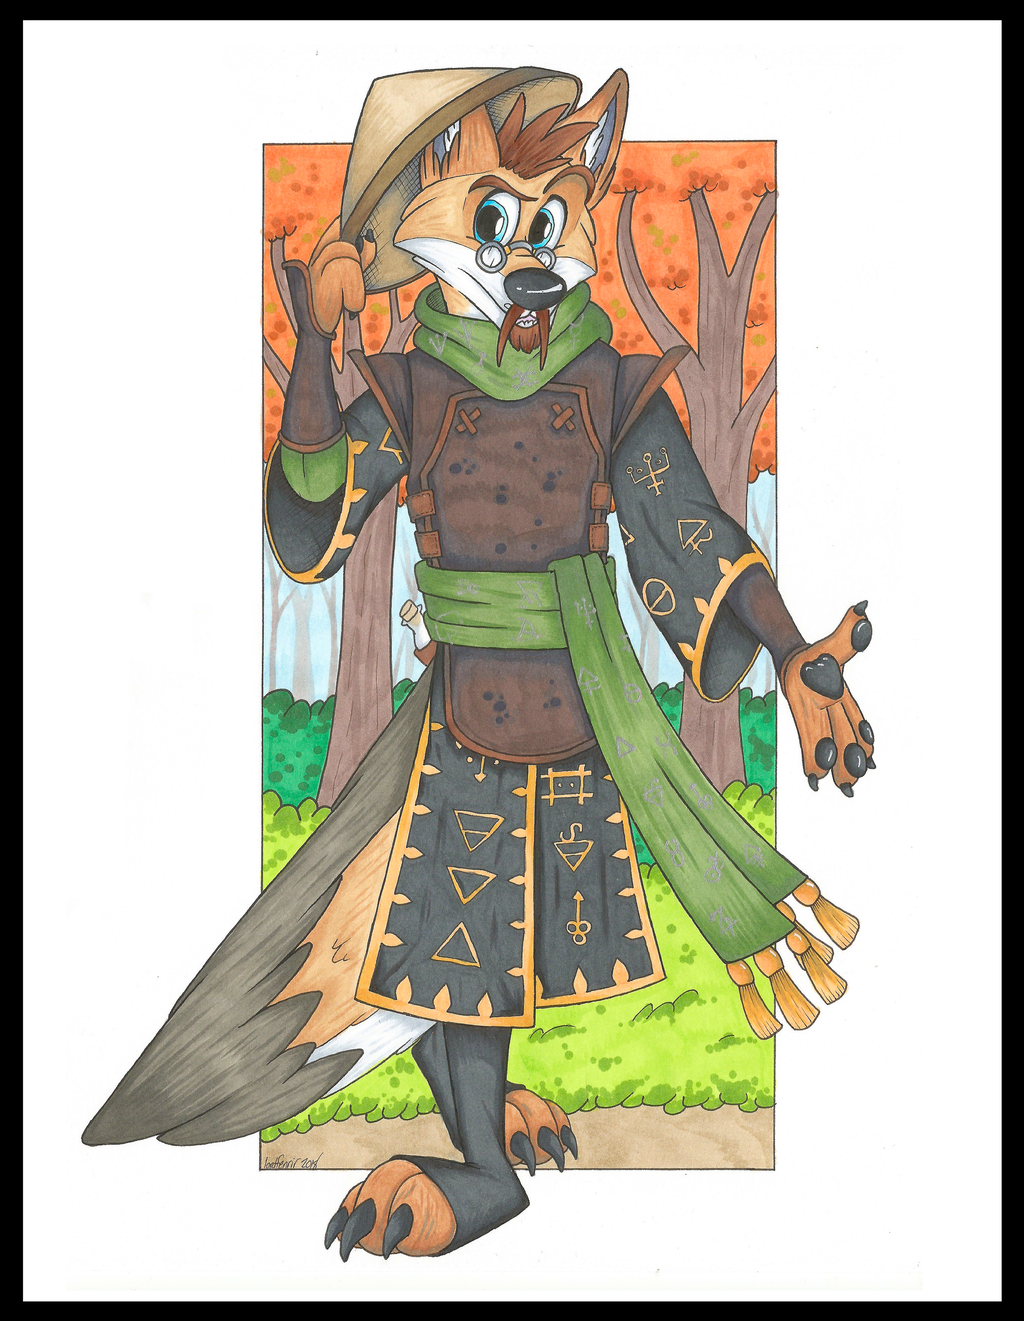 Most recent image: Samuel, Coyote Alchemist